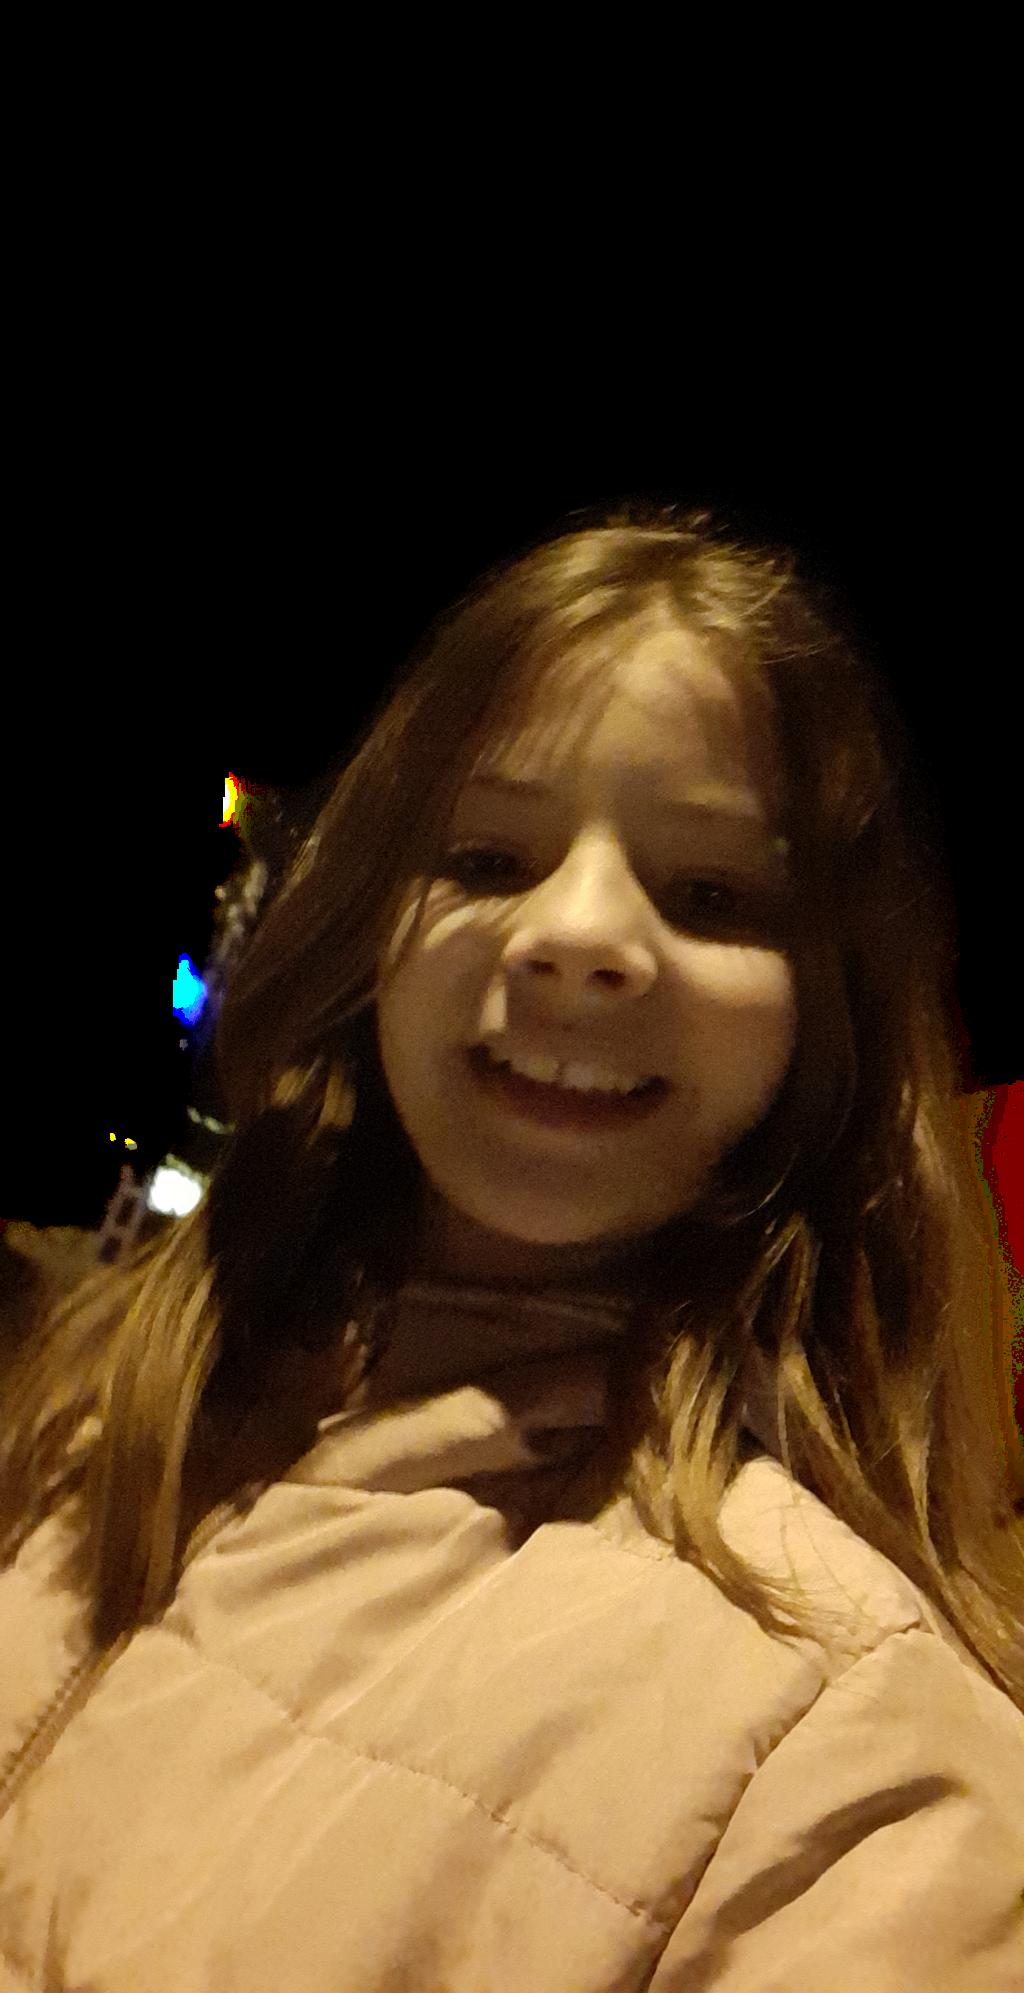 #HAPPY NEW YEAR